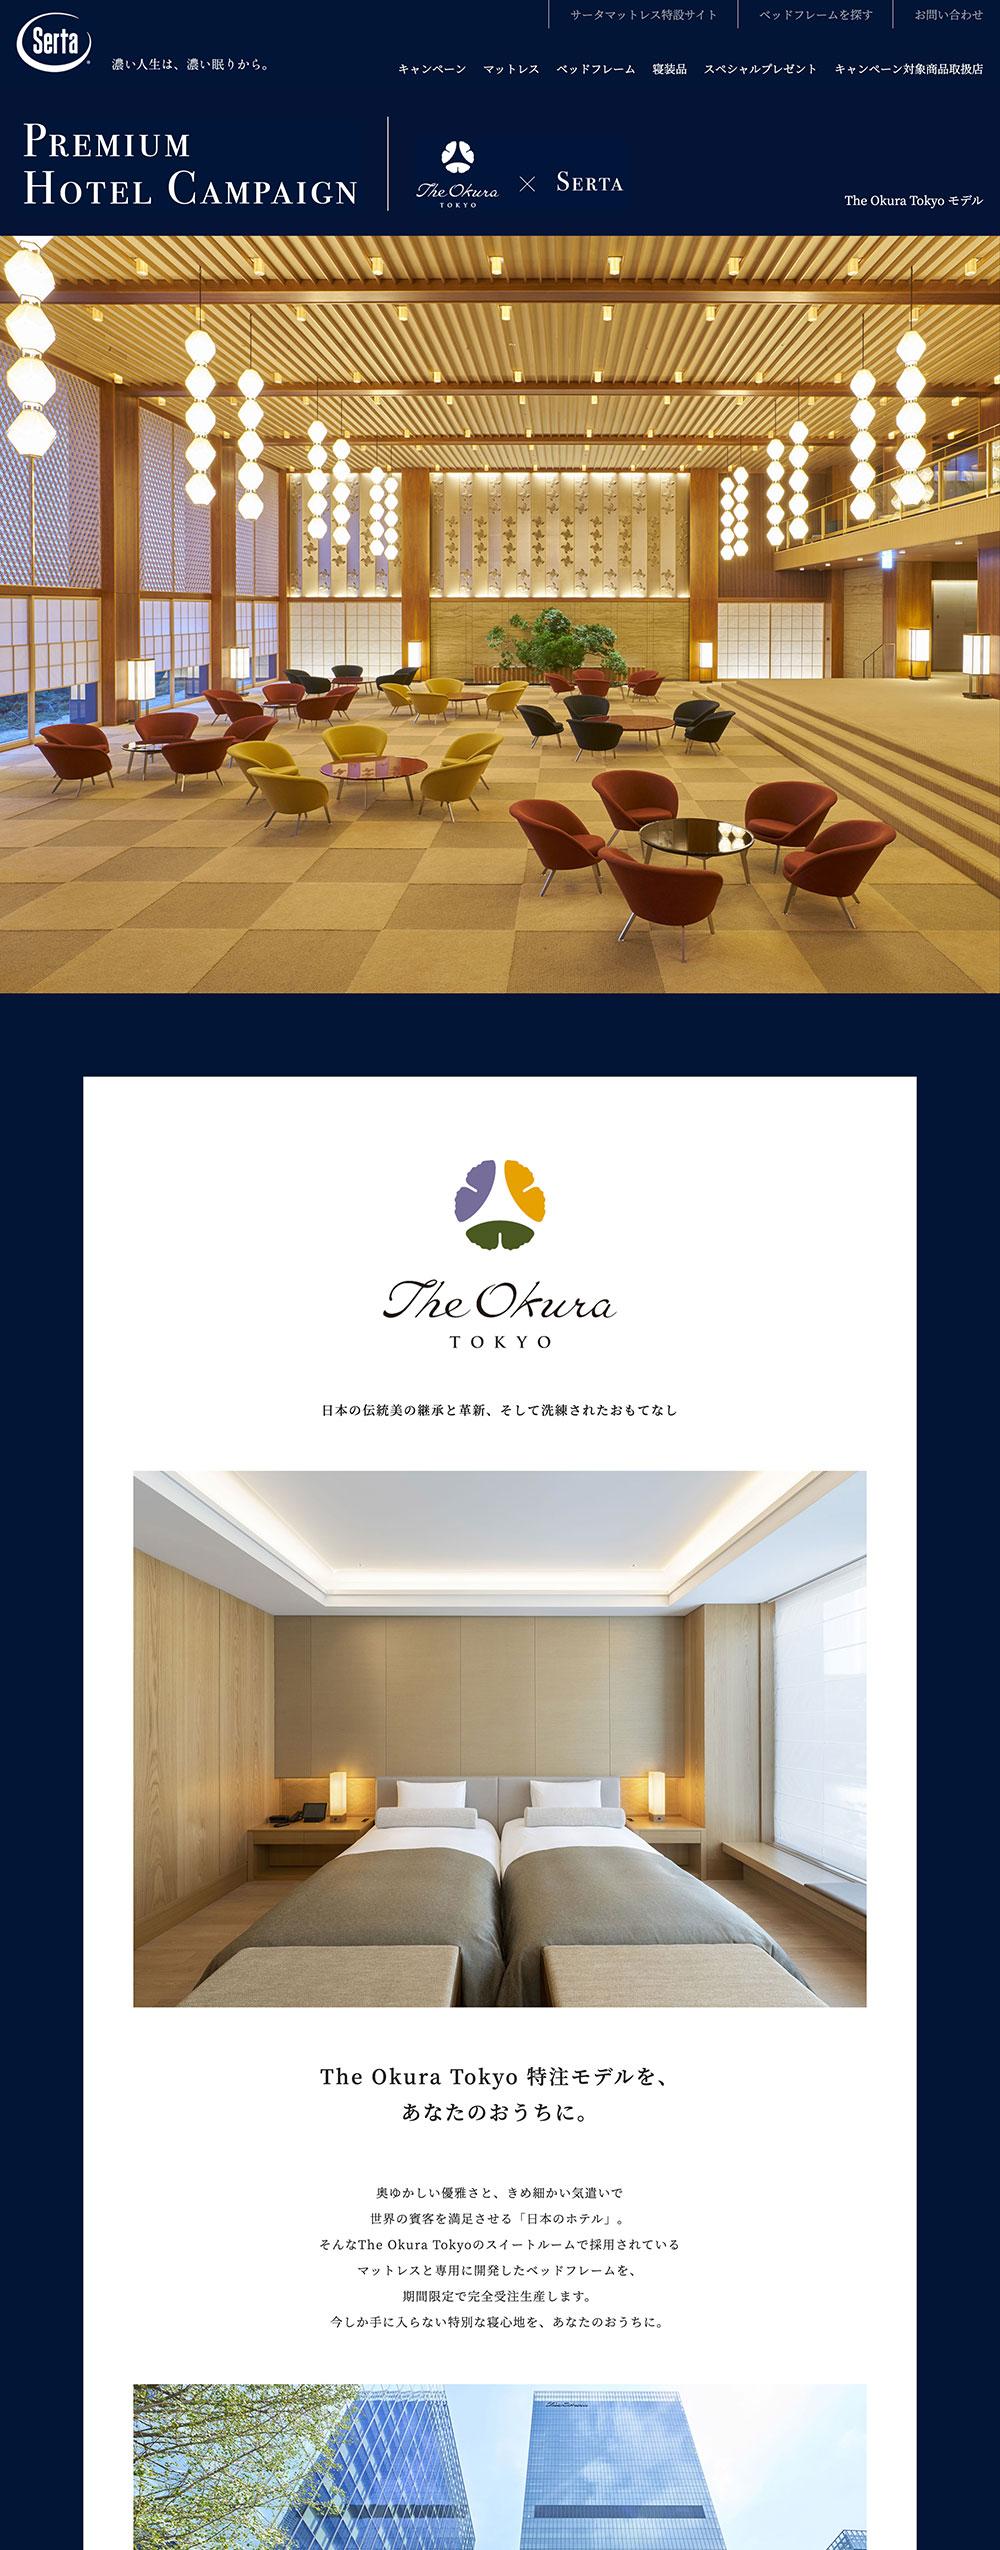 Dreambed Serta Premium Hotel Campaign  THE OKURA TOKYO